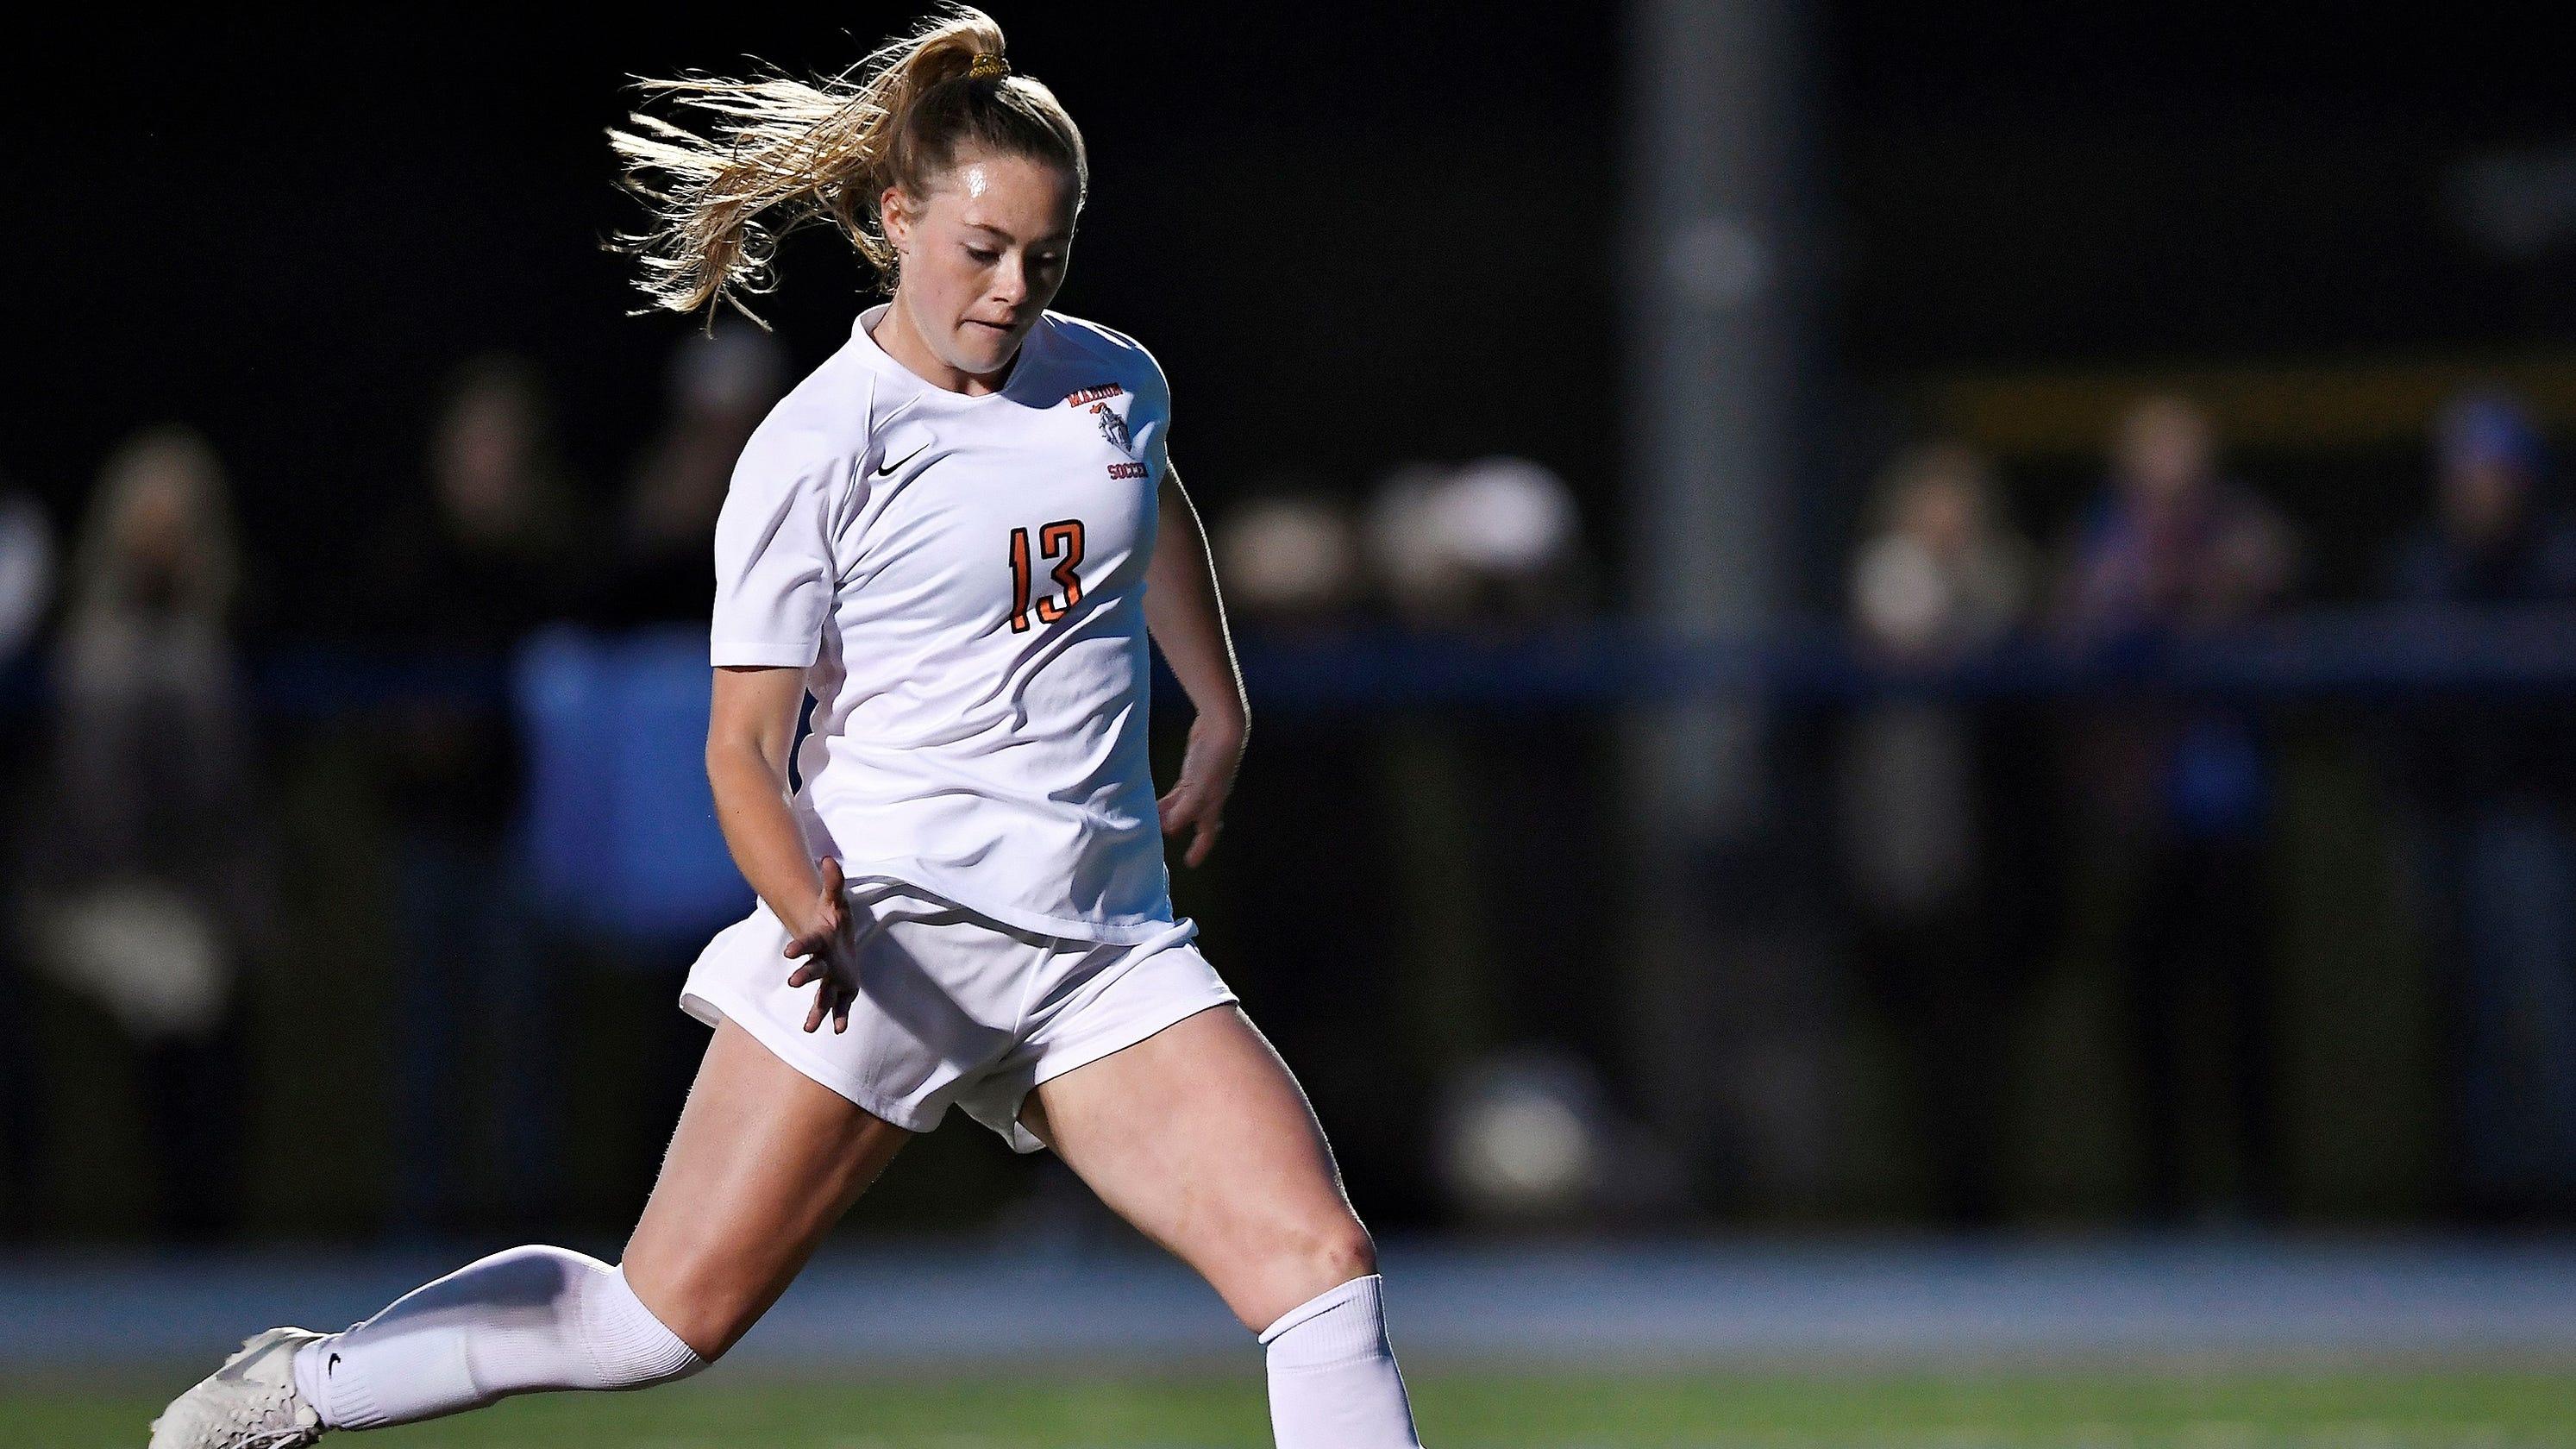 High school soccer star Chloe DeLyser's national goal-scoring record isn't official